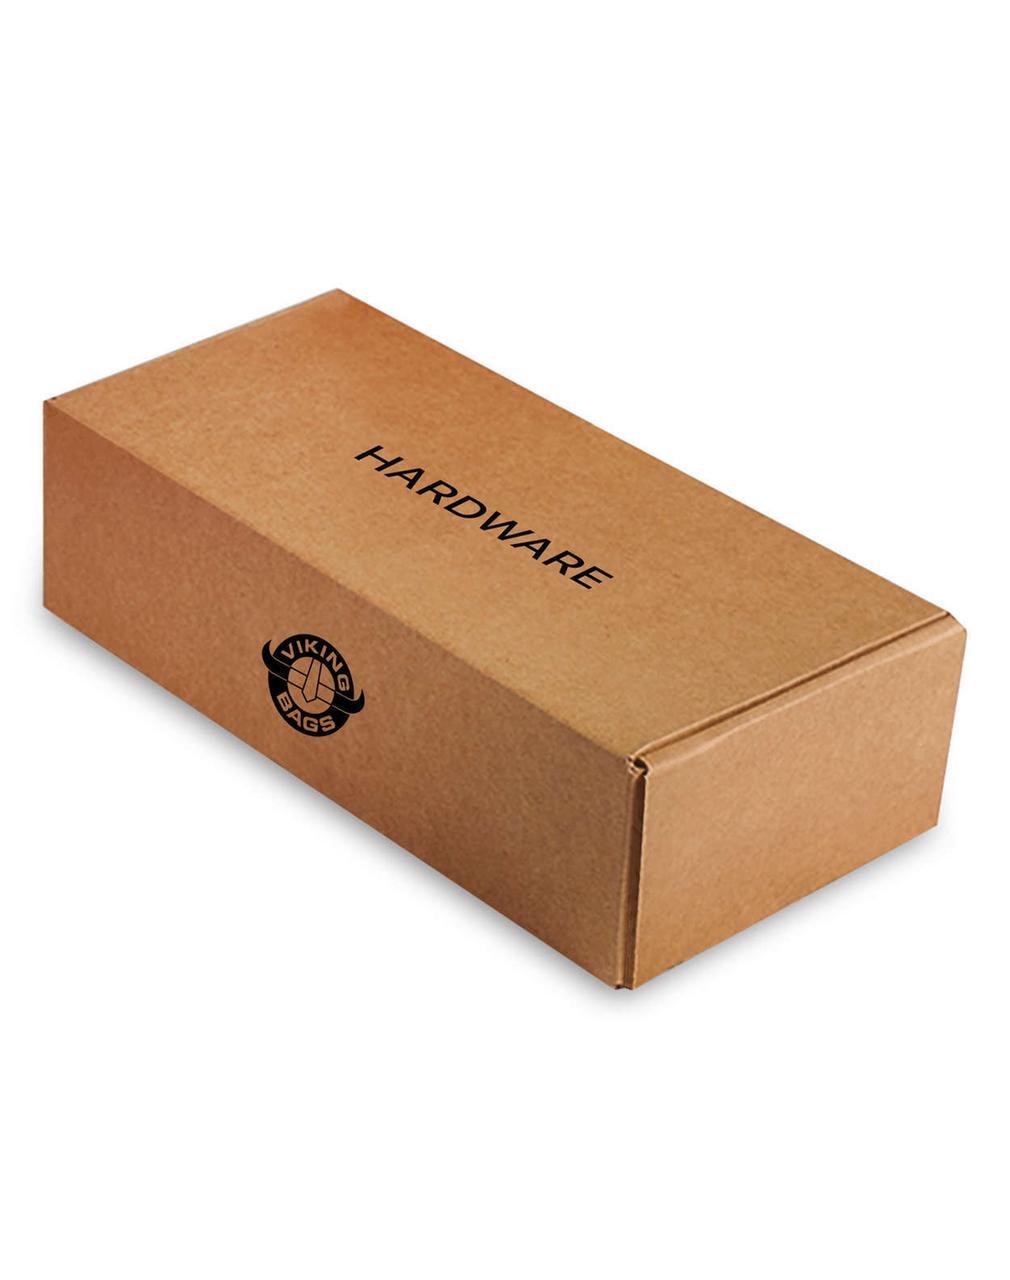 Honda CMX 250C Rebel 250 Thor Series Small Motorcycle Saddlebags Hardware Box